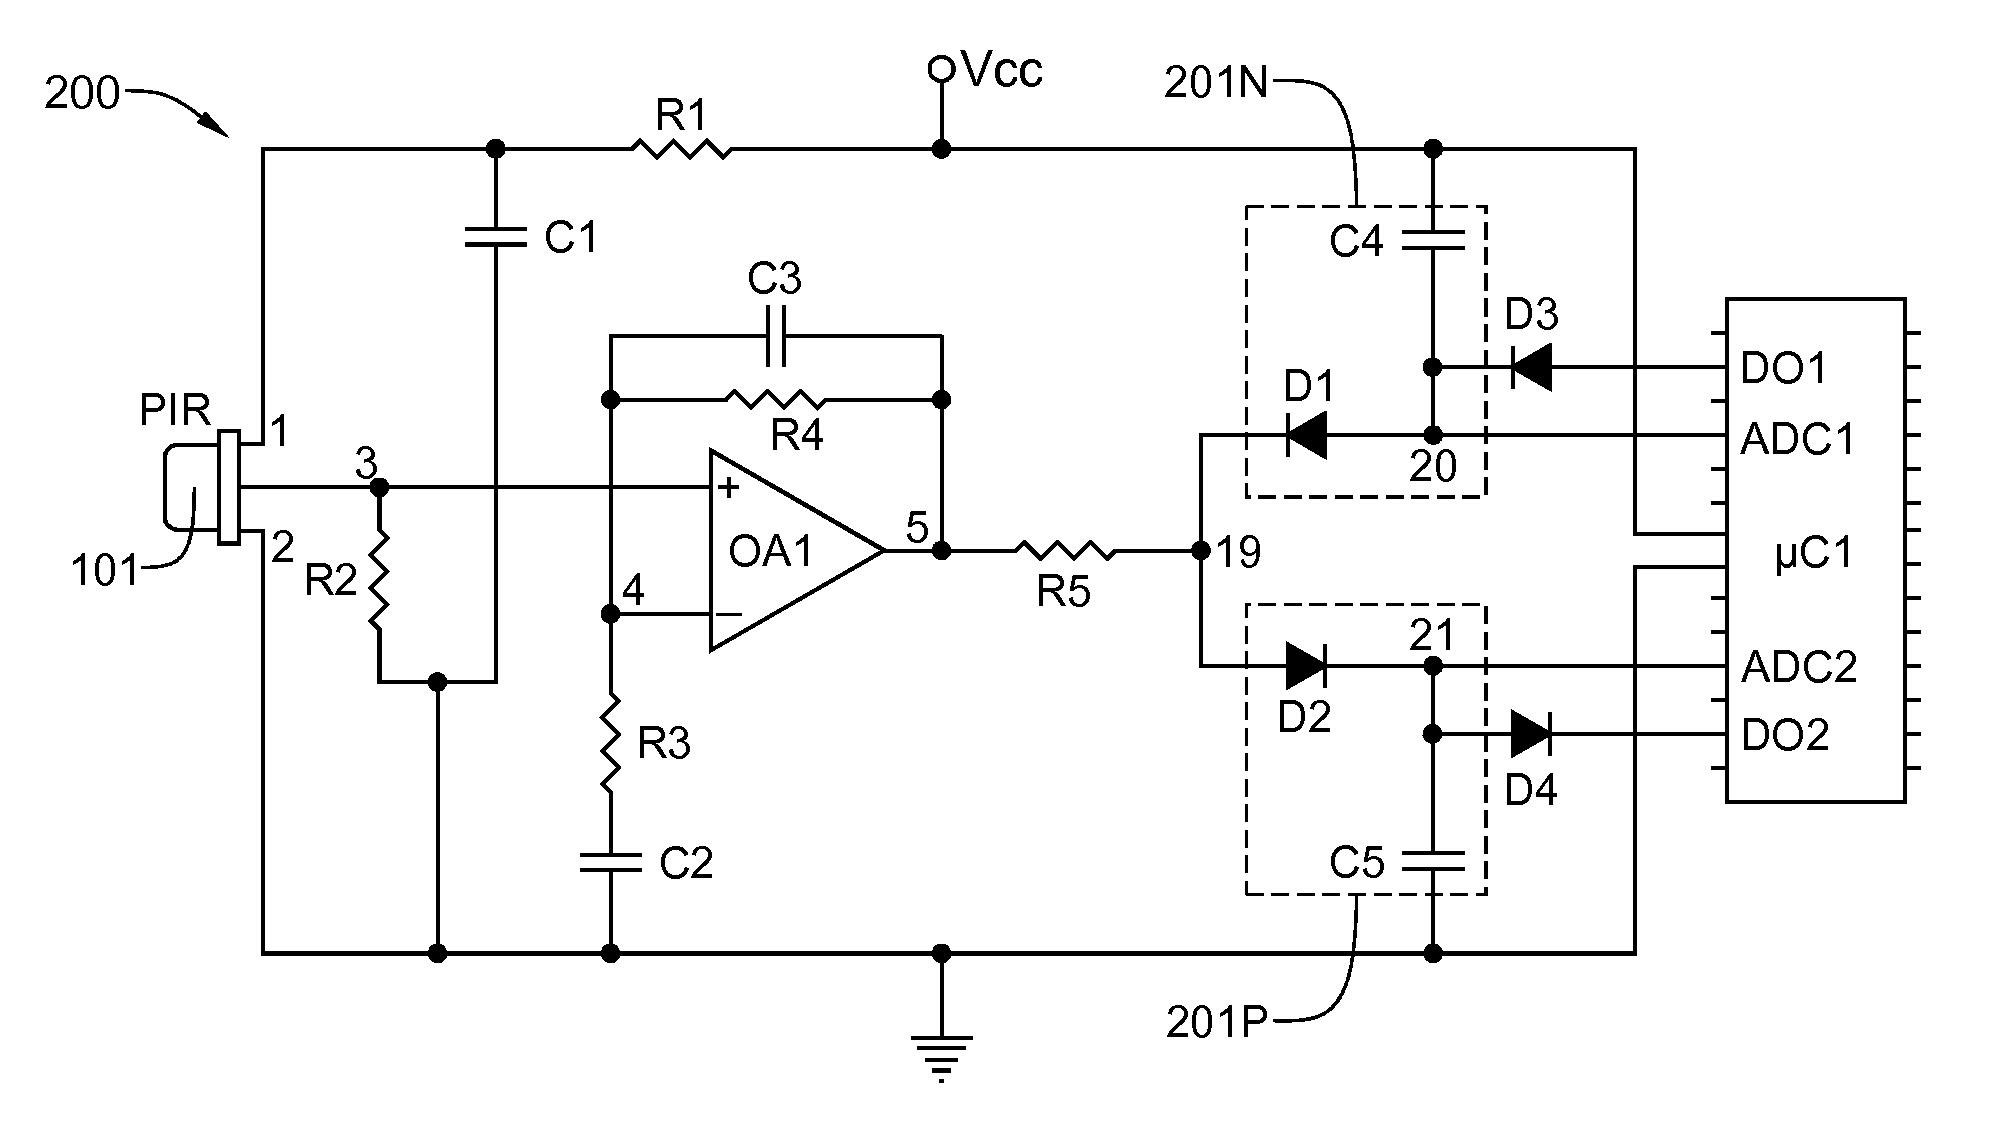 Pir Sensor Schematic Lm324 Wiring Data Diagram Auto Electrical U2022 Rh 6weeks Co Uk Motion